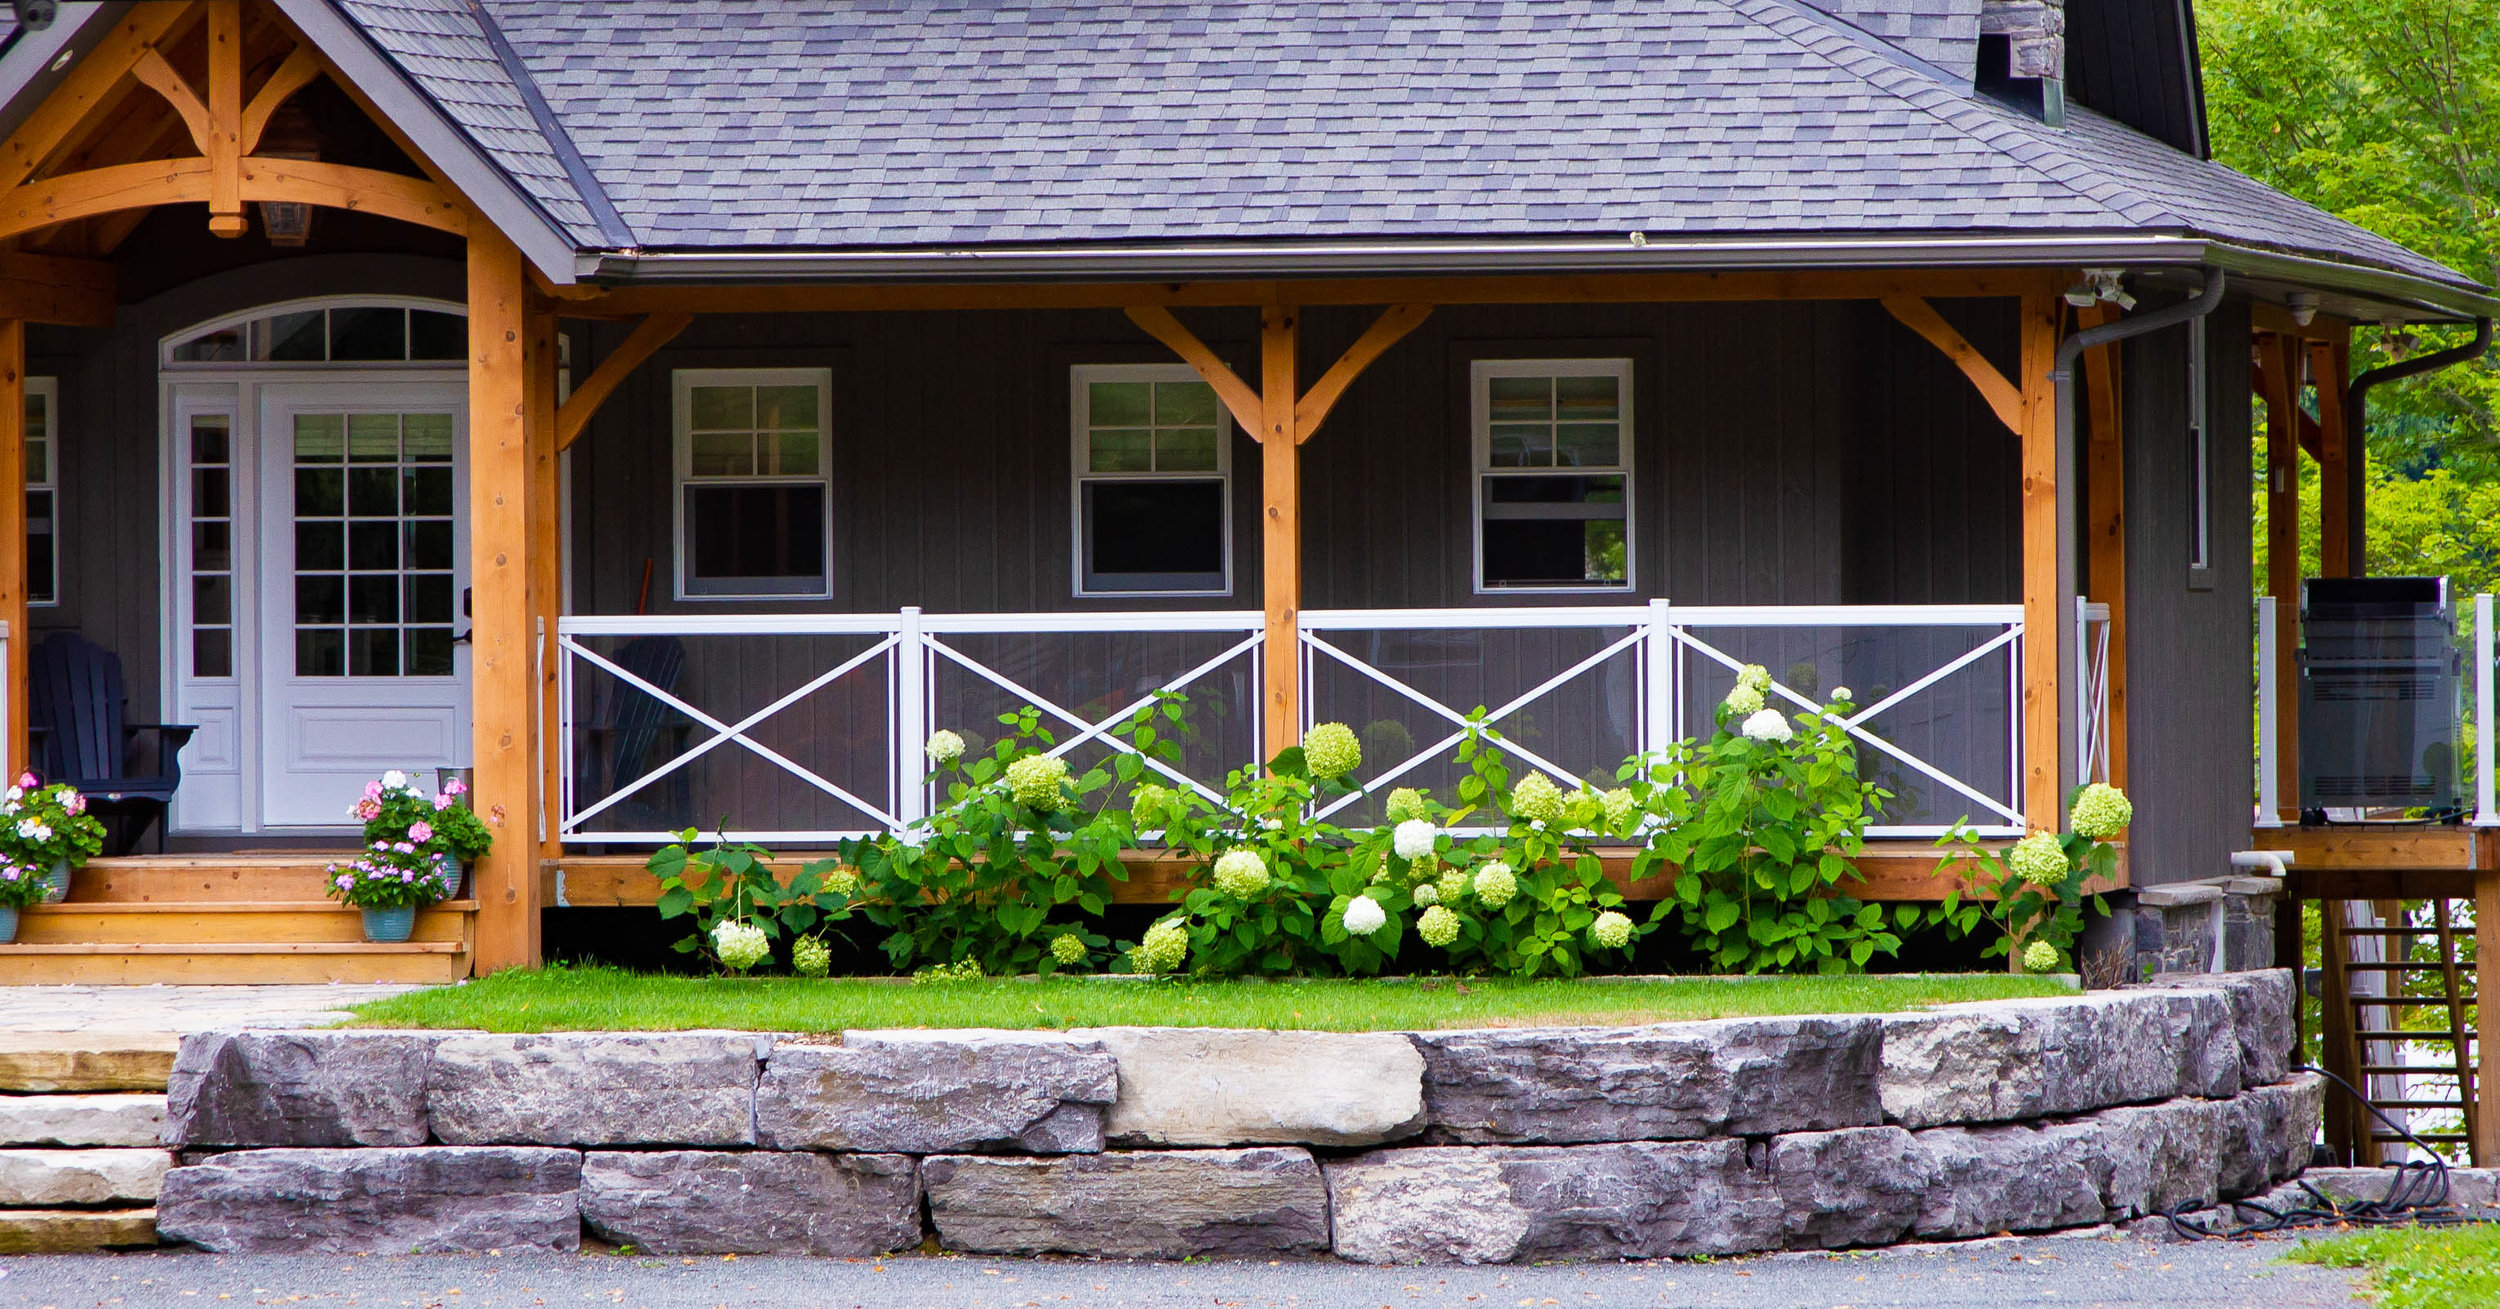 Raised Flower Garden